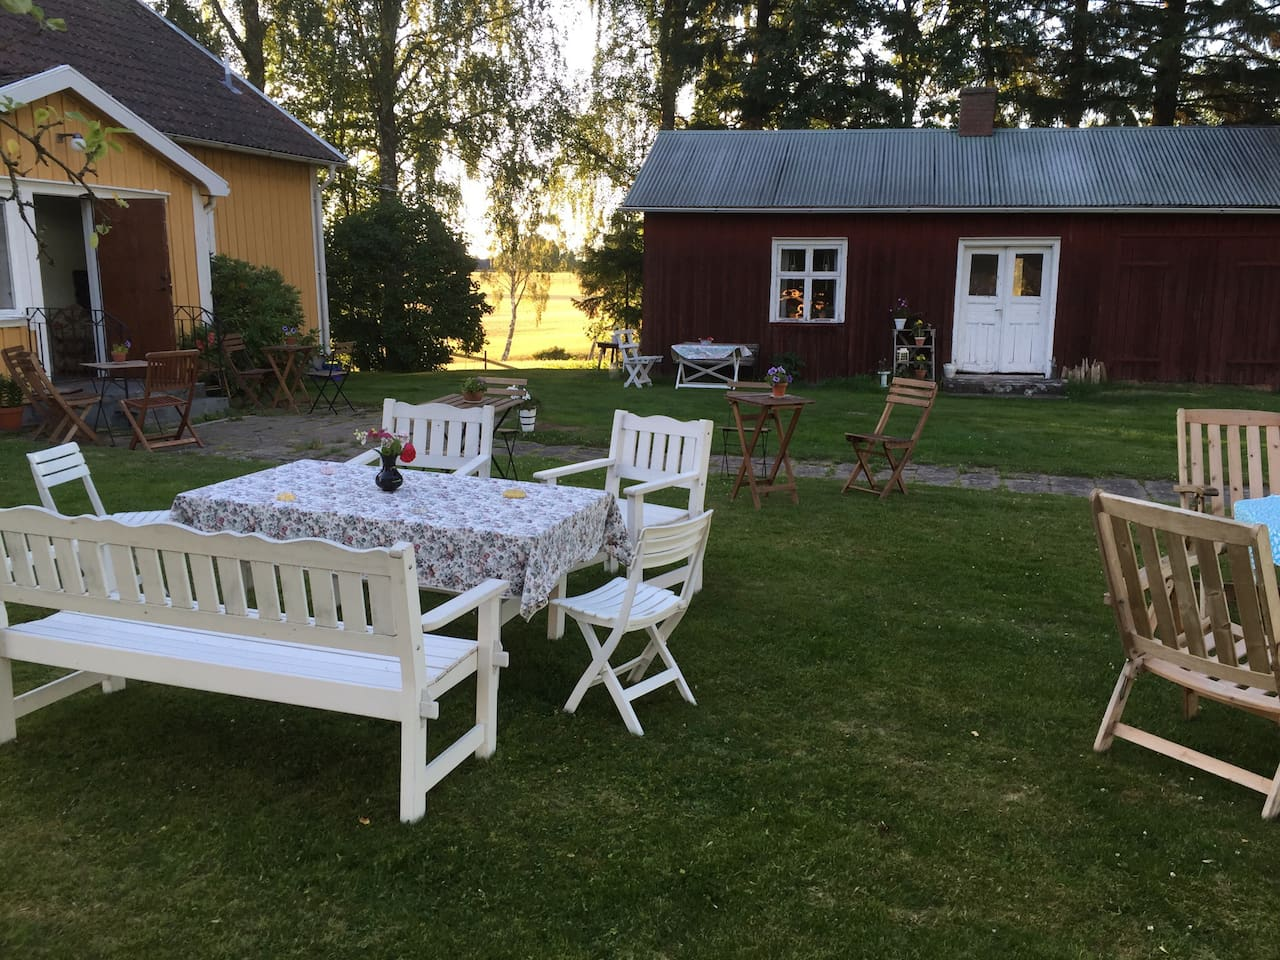 Top 20 lidköping vacation rentals, vacation homes & condo rentals ...